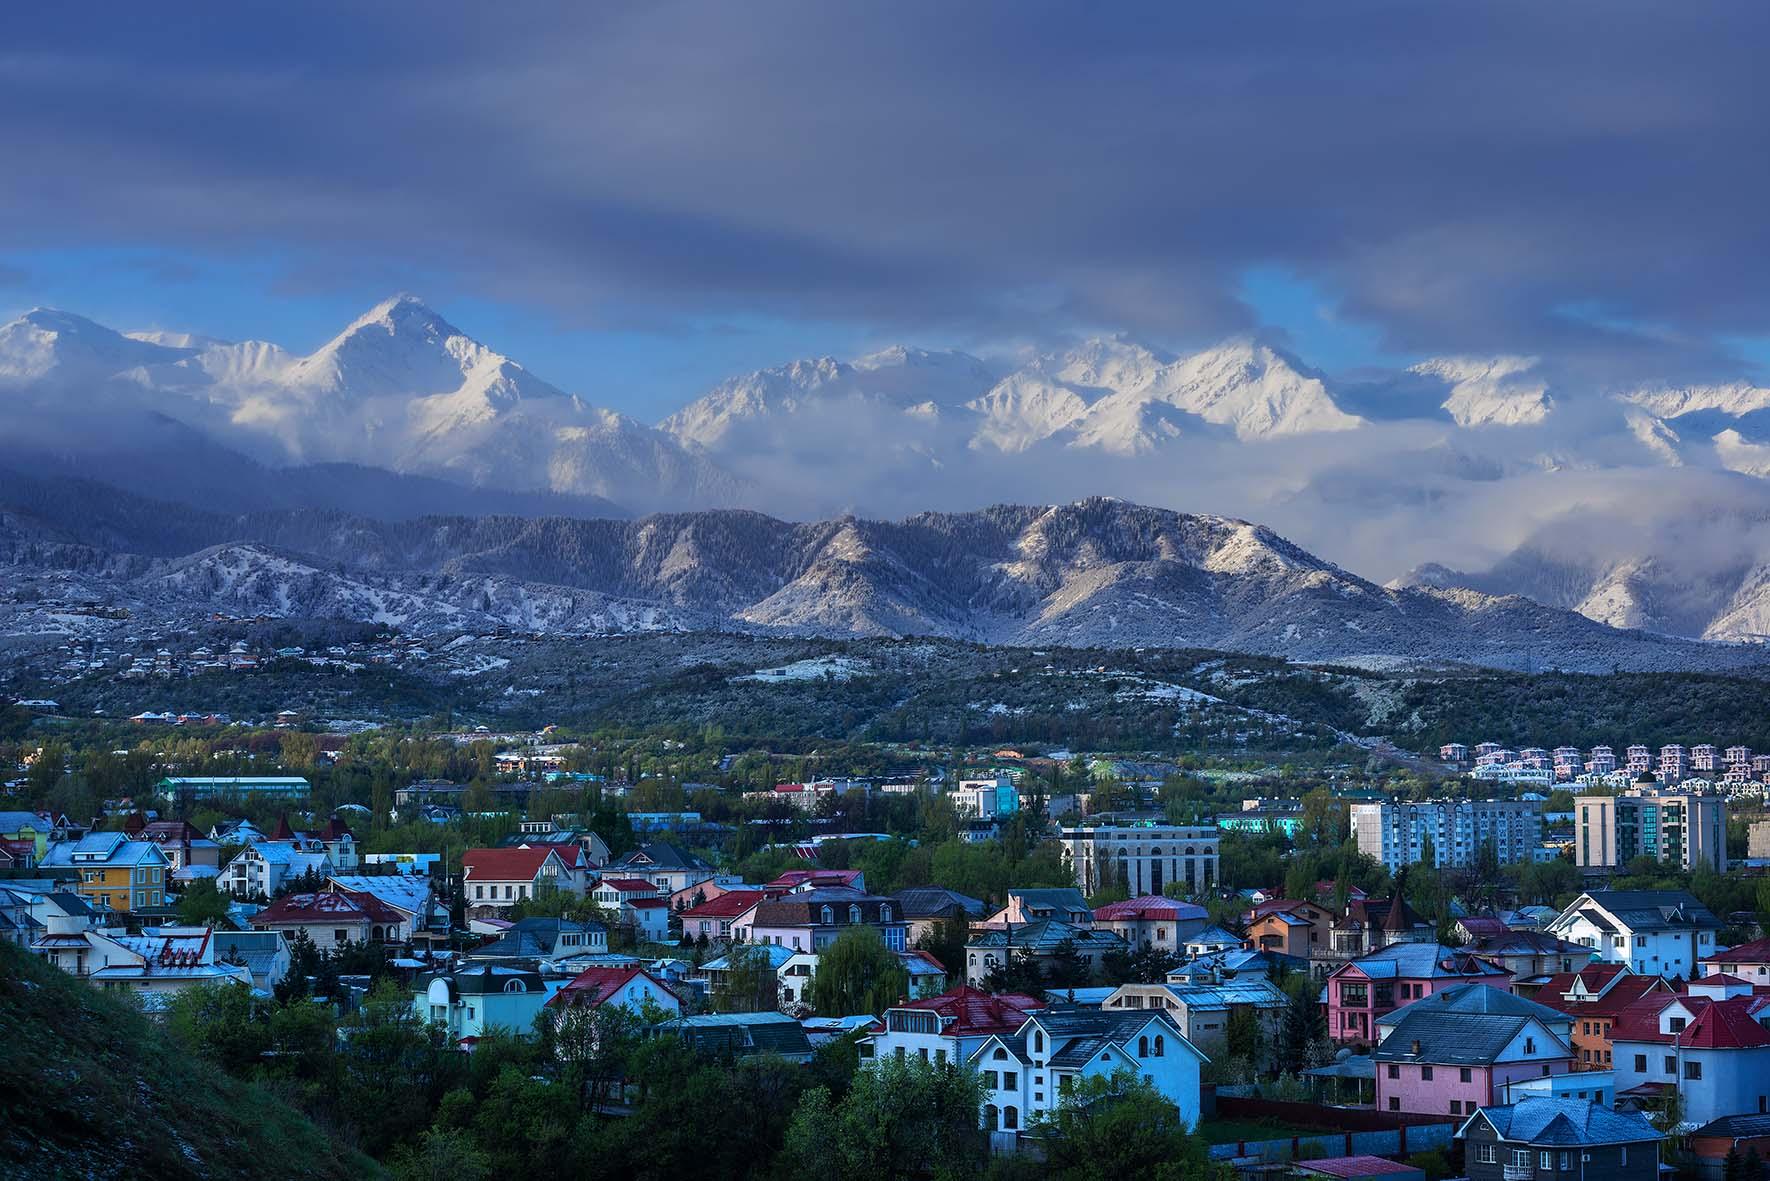 Almaty, Astana Mark Intl Olympic Day as Bid Preparations